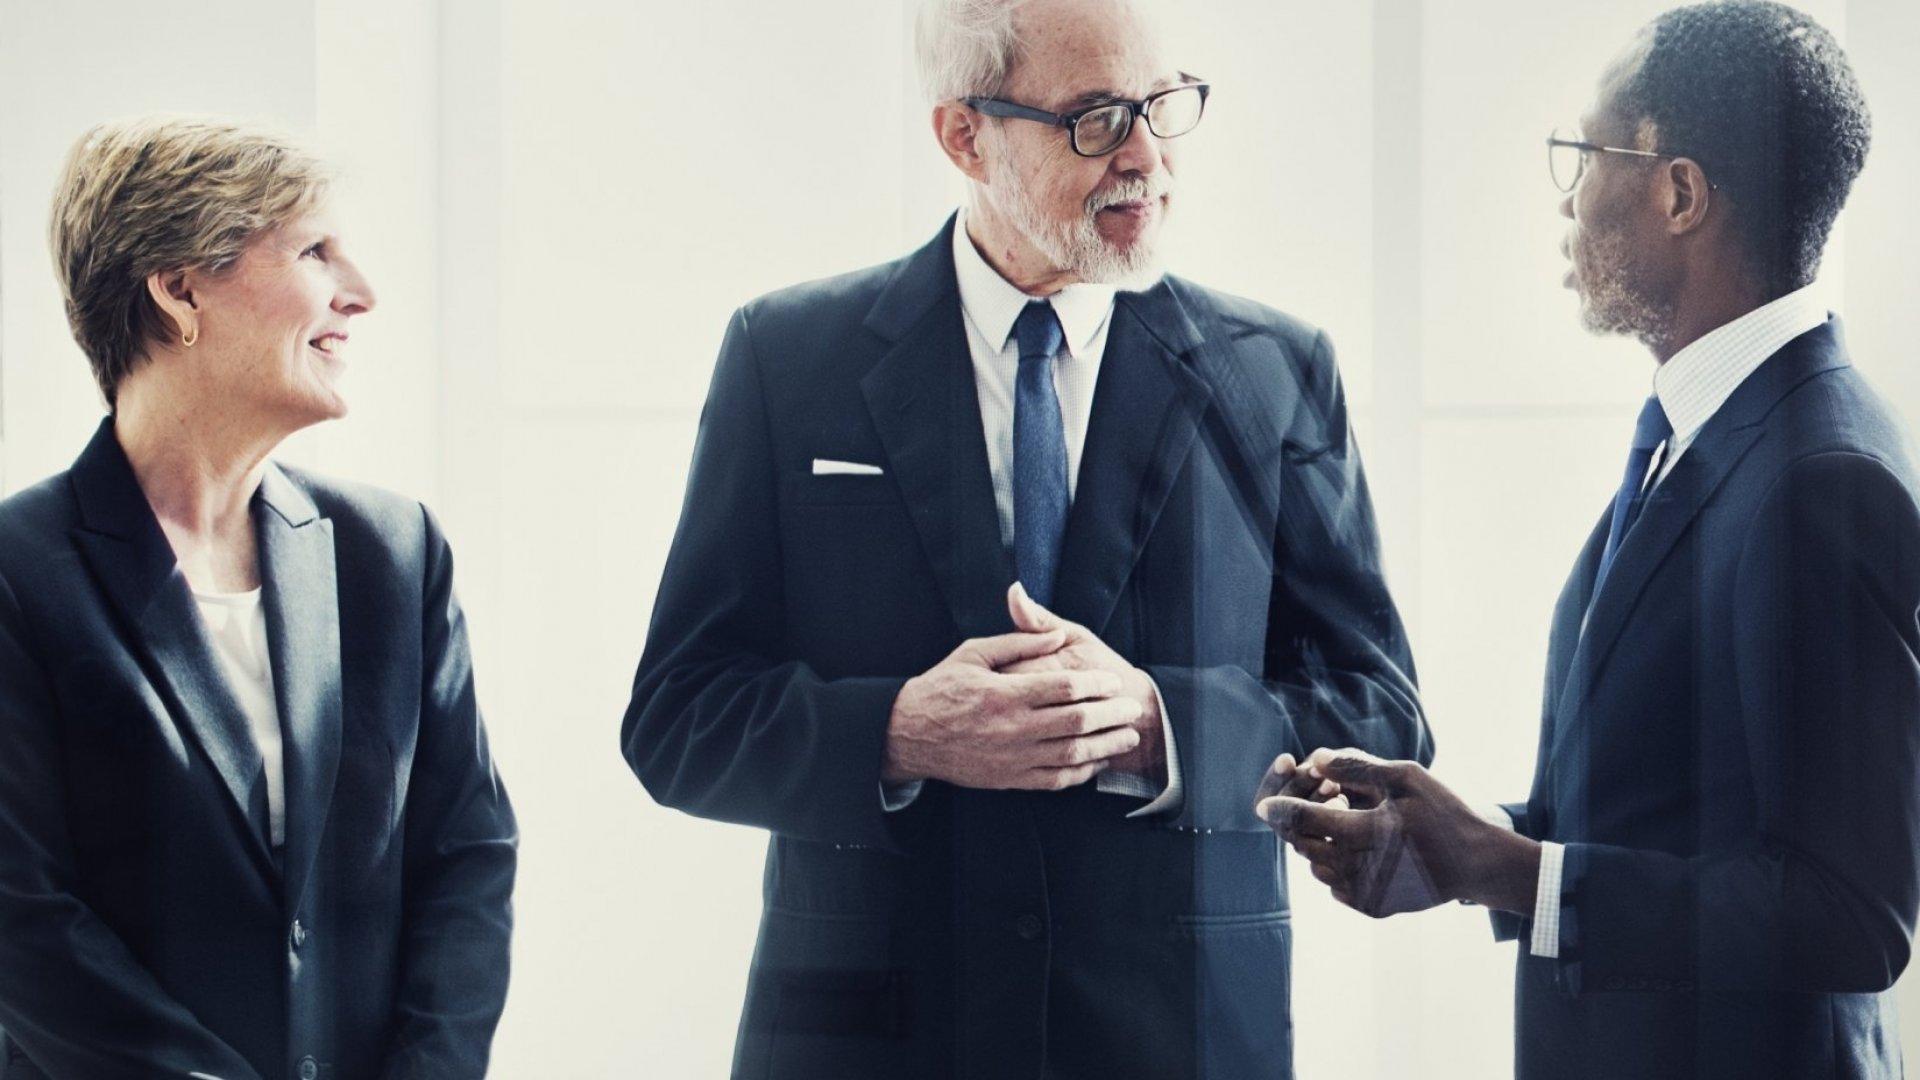 How Do You Develop Executive Gravitas?